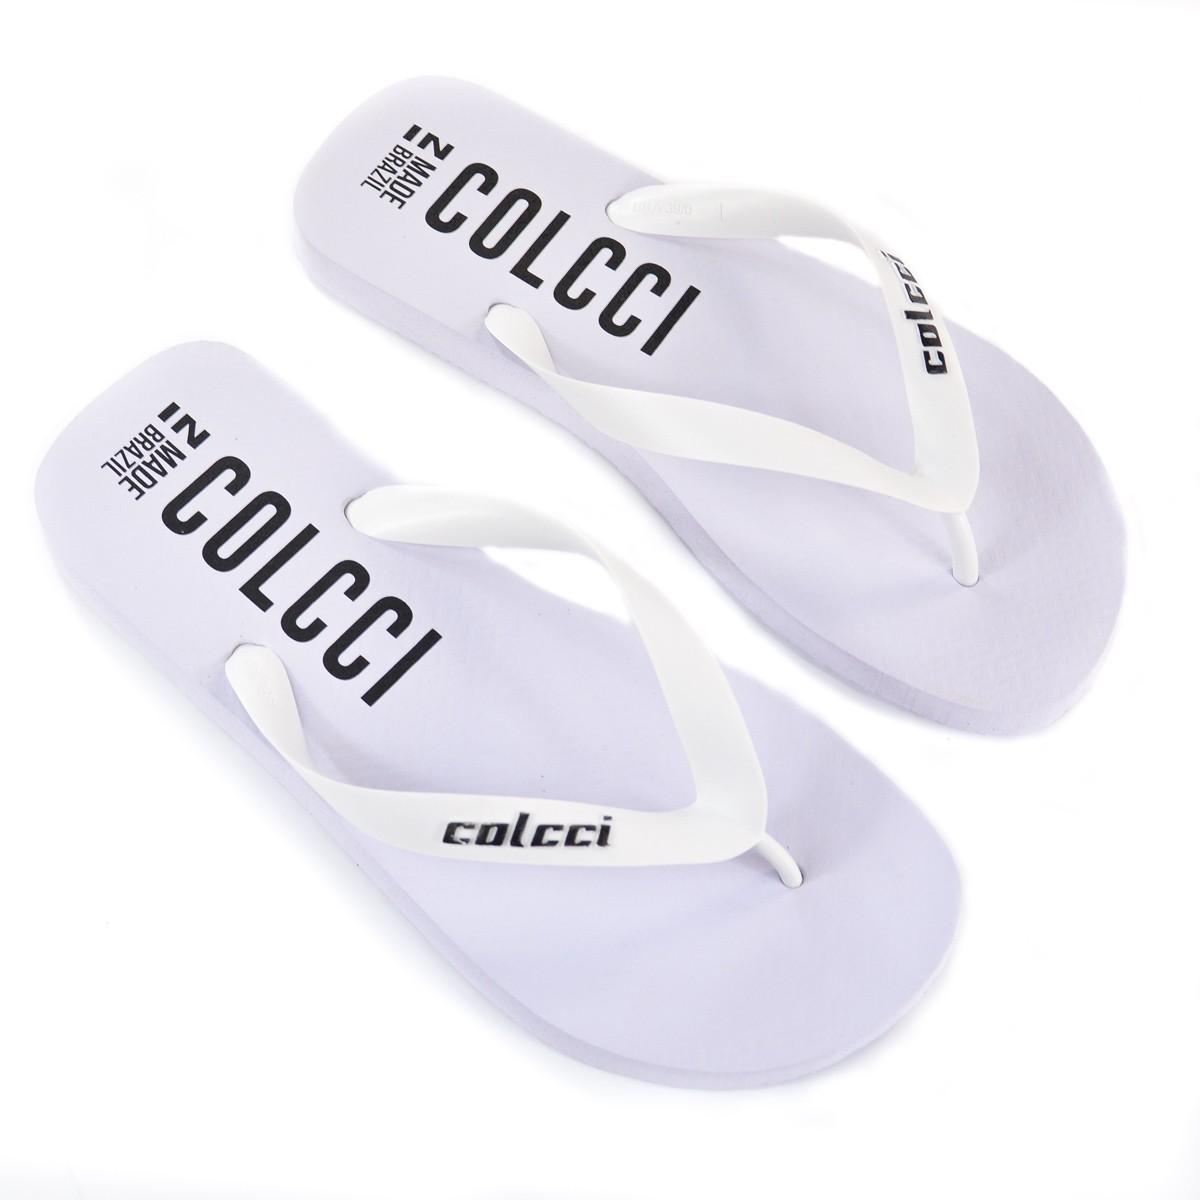 CHINELO MASC 80601.00703 BRANCO NEON COLCCI 92820